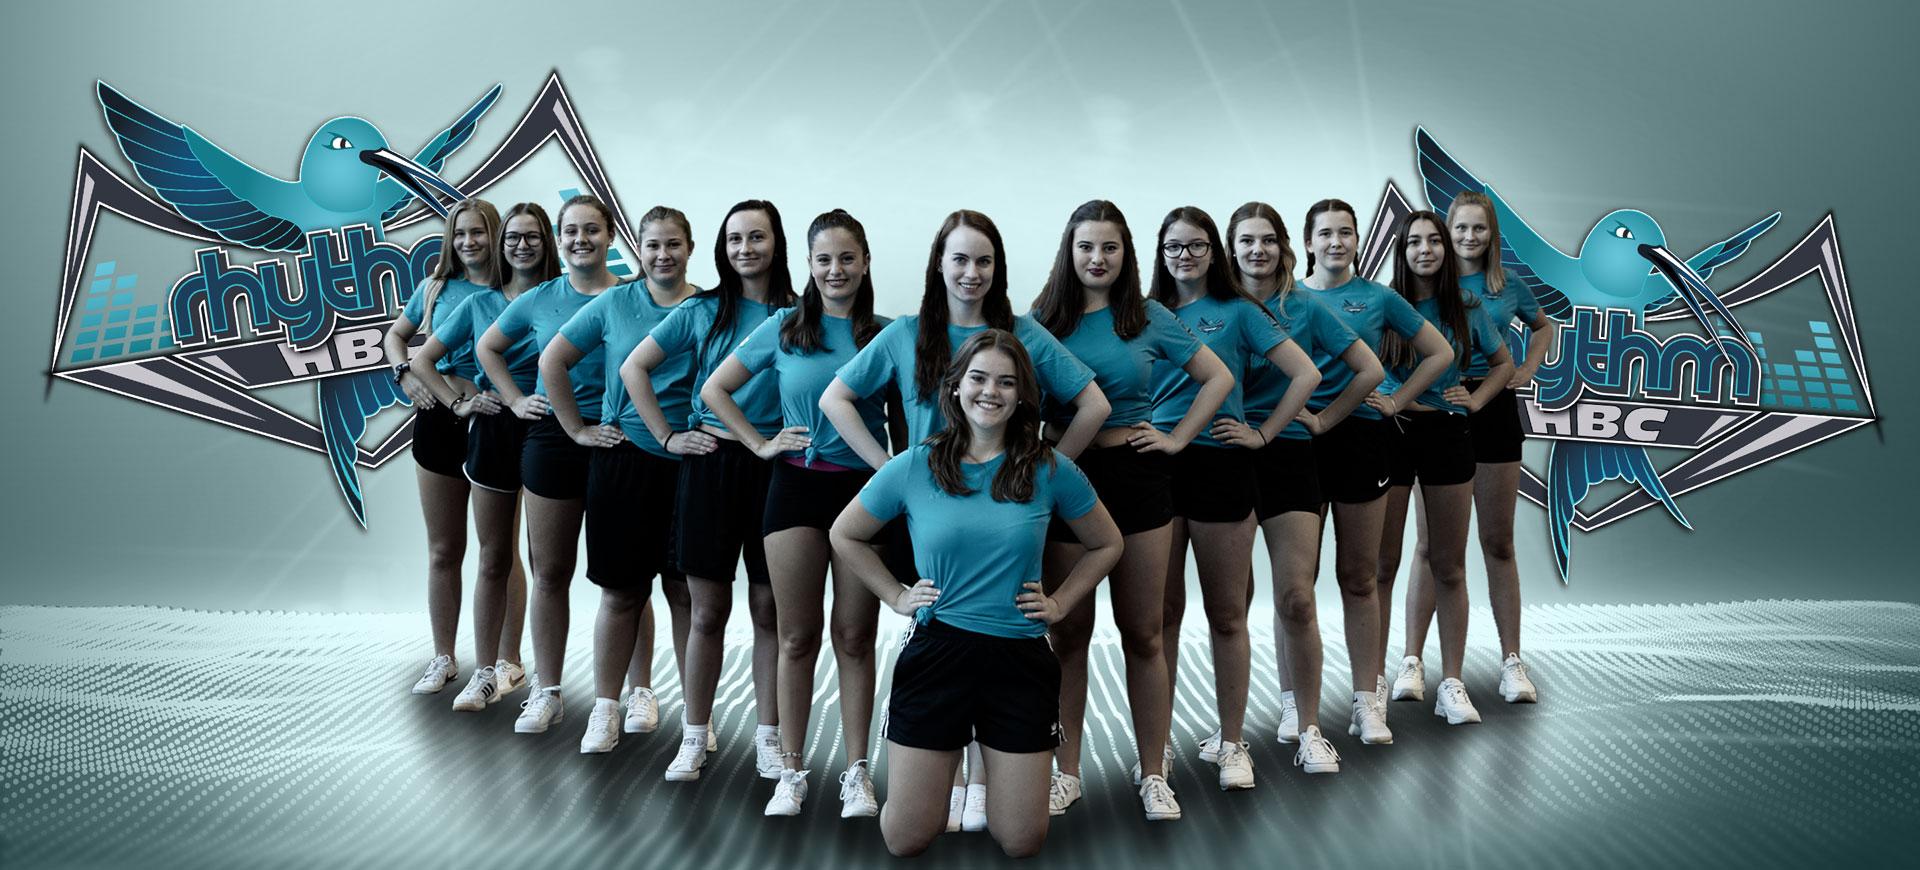 Team HBC Rhythm